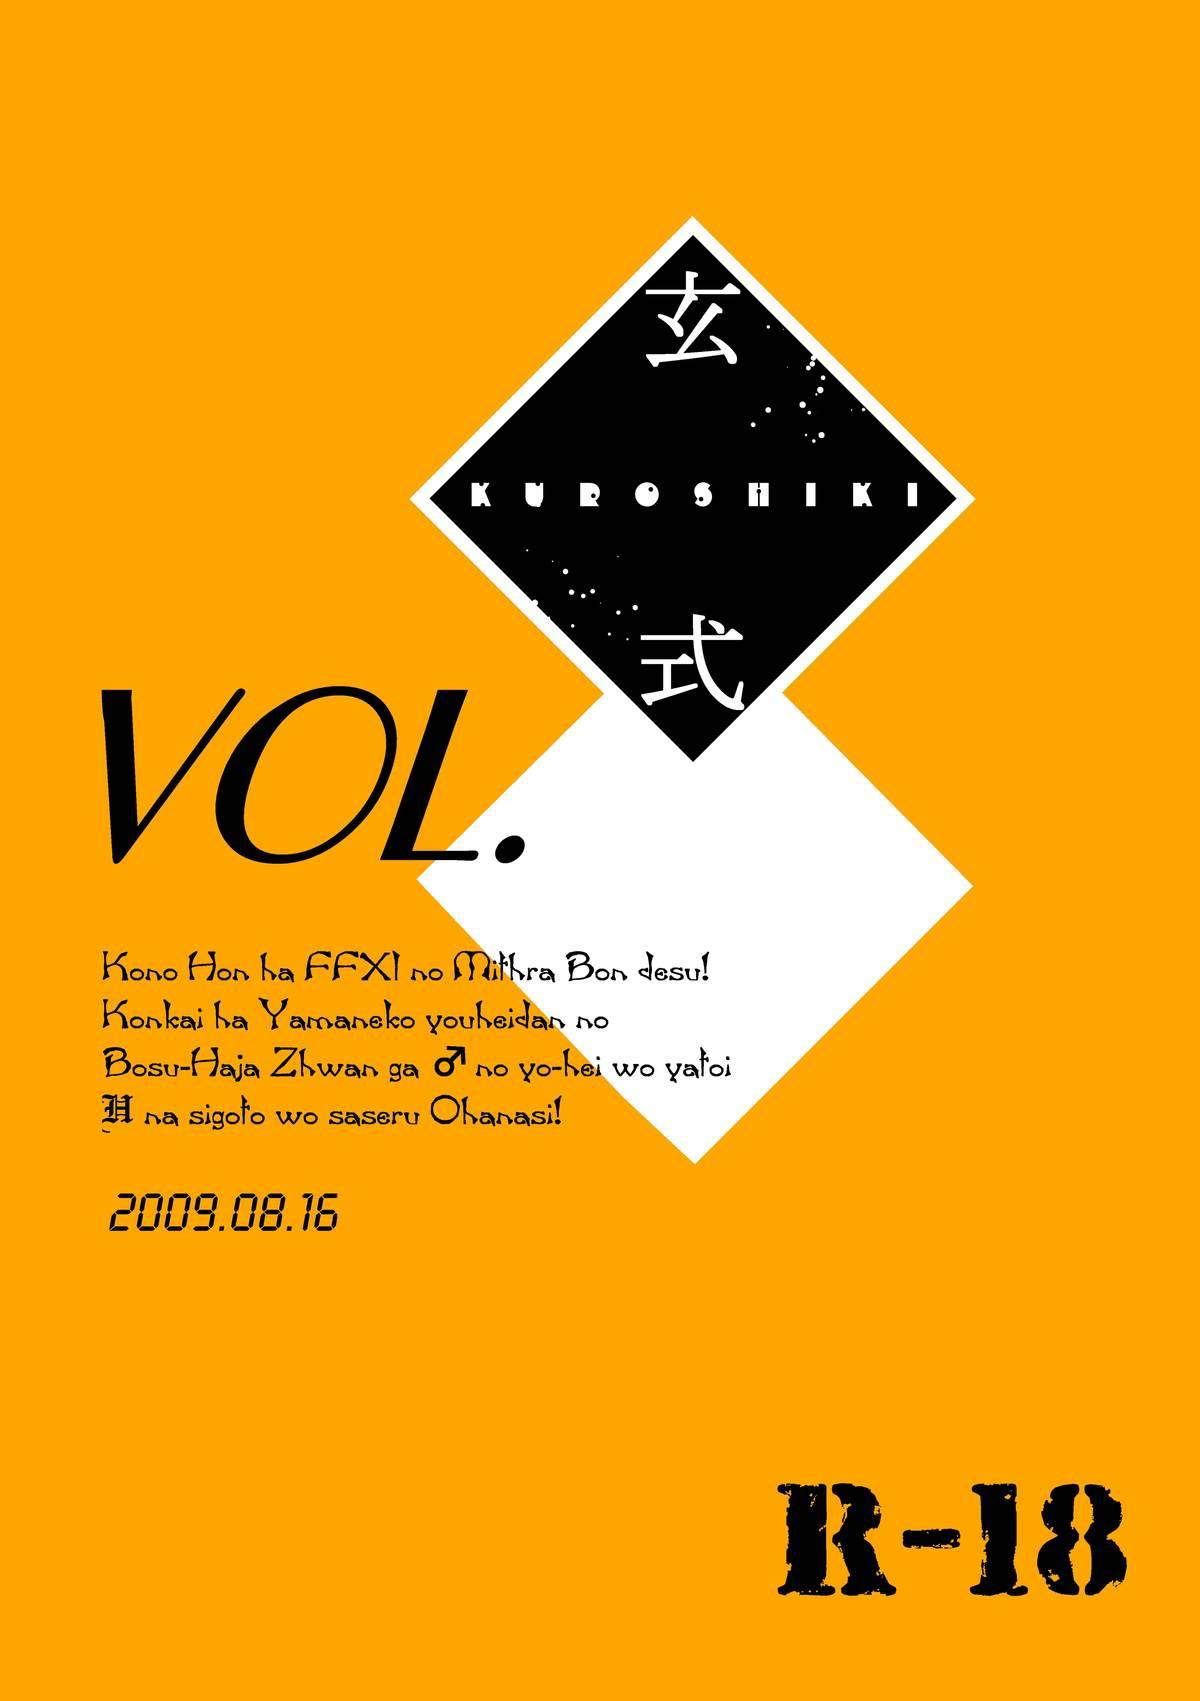 Kuroshiki Vol. 8 21